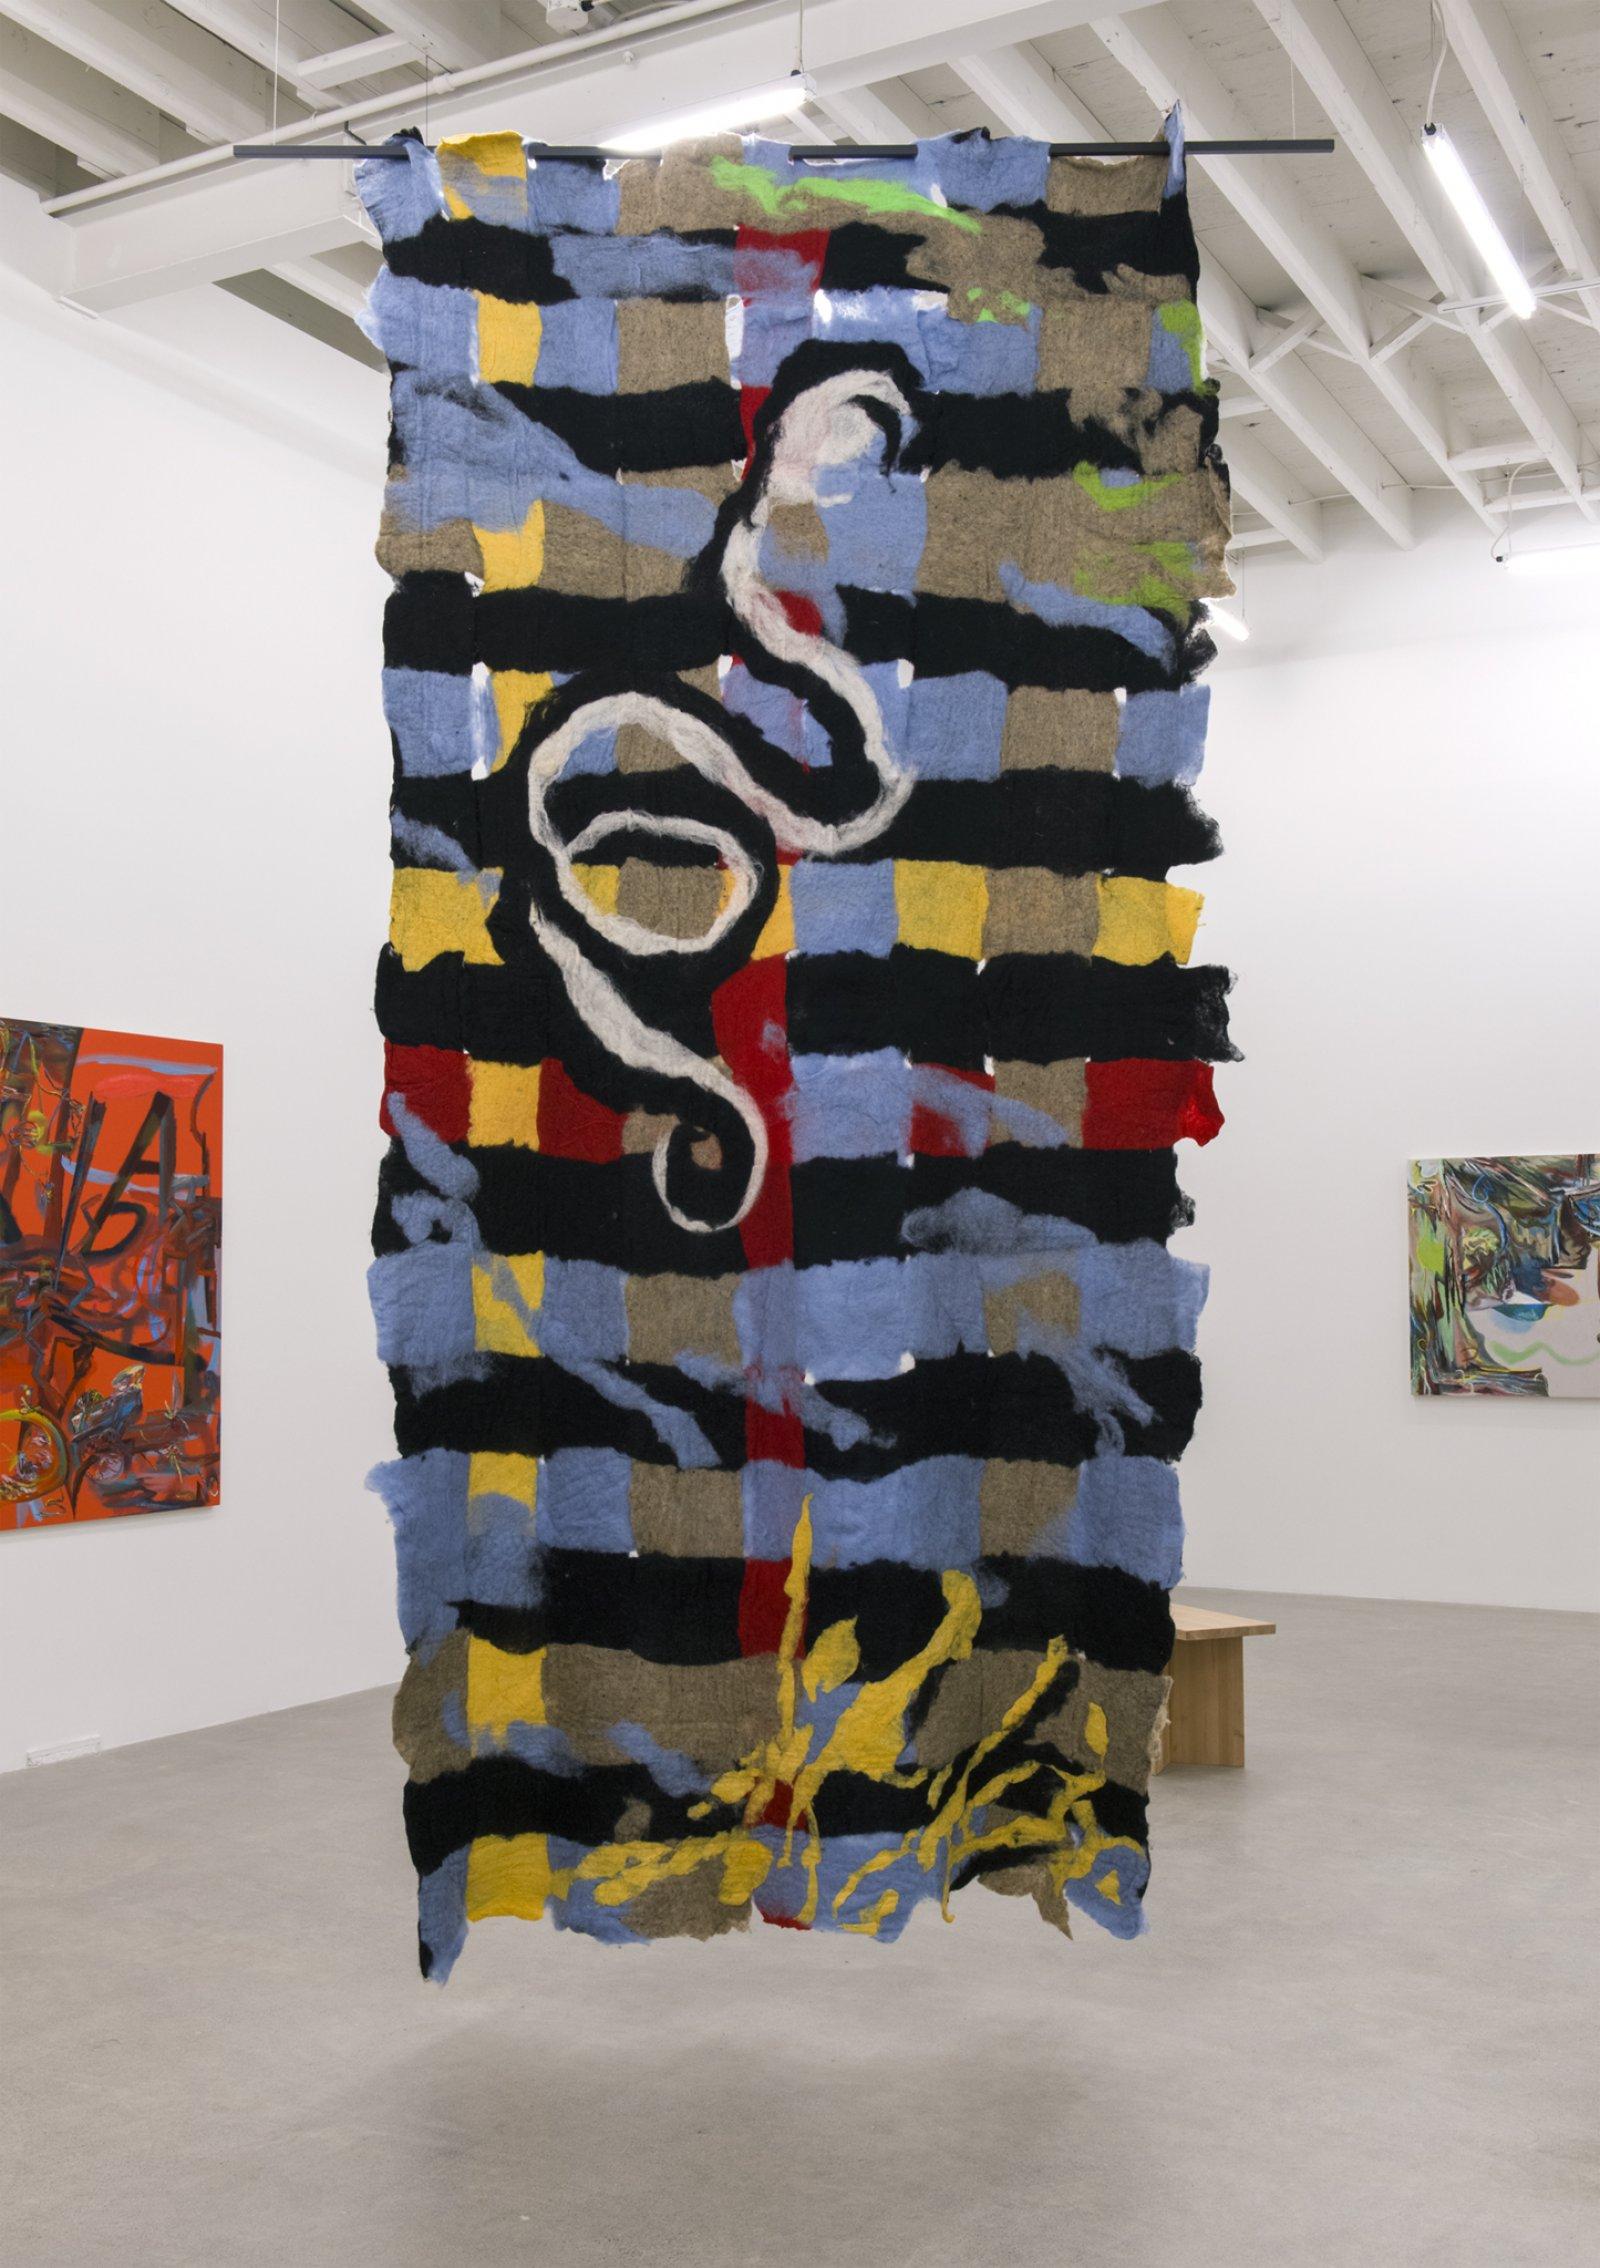 Rebecca Brewer, Inuus, 2016, wool felt, painted aluminum, 141 x 65 in. (358 x 165 cm) by Rebecca Brewer